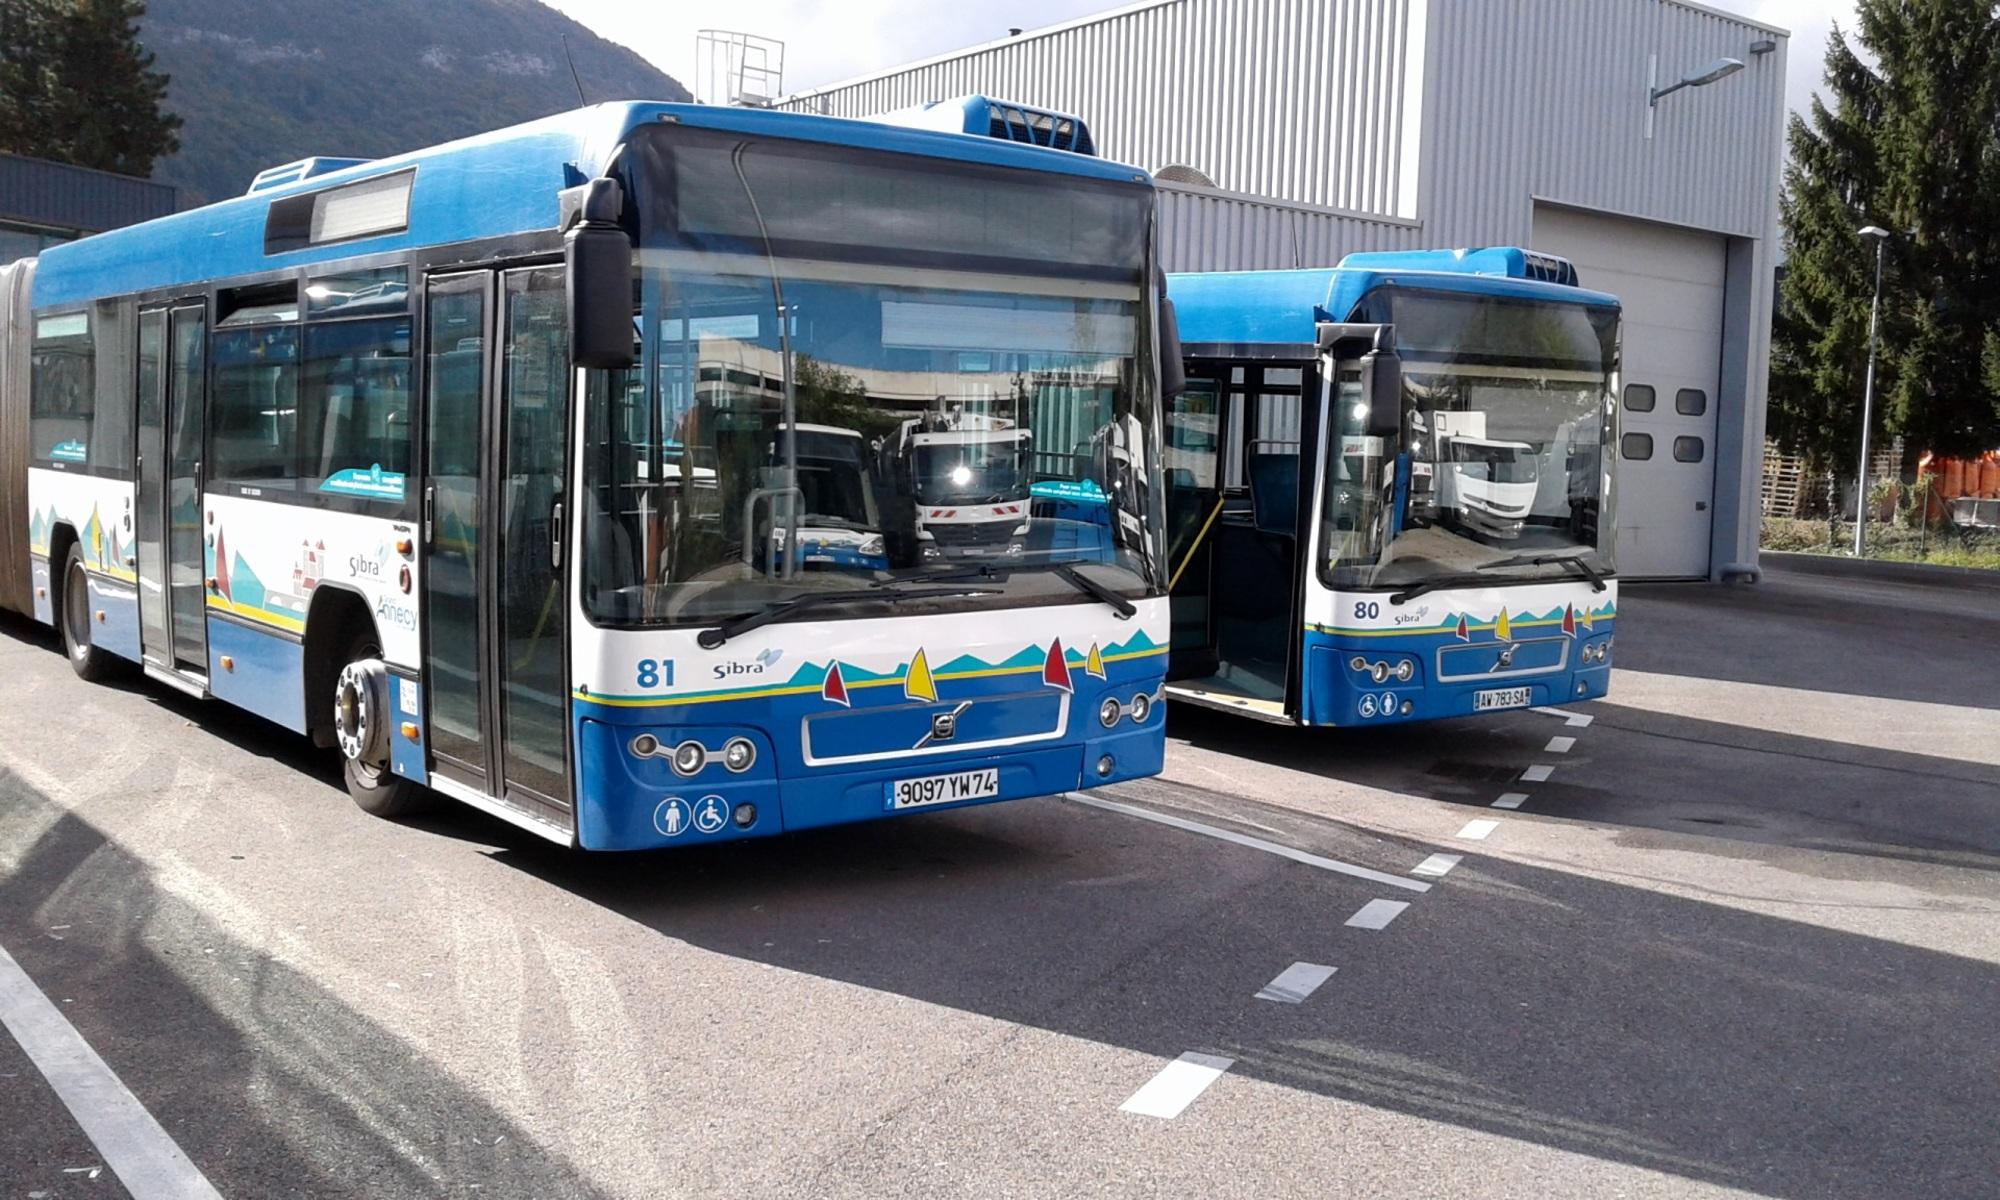 bus volvo a 92 car bus d 39 occasion aux ench res agorastore. Black Bedroom Furniture Sets. Home Design Ideas